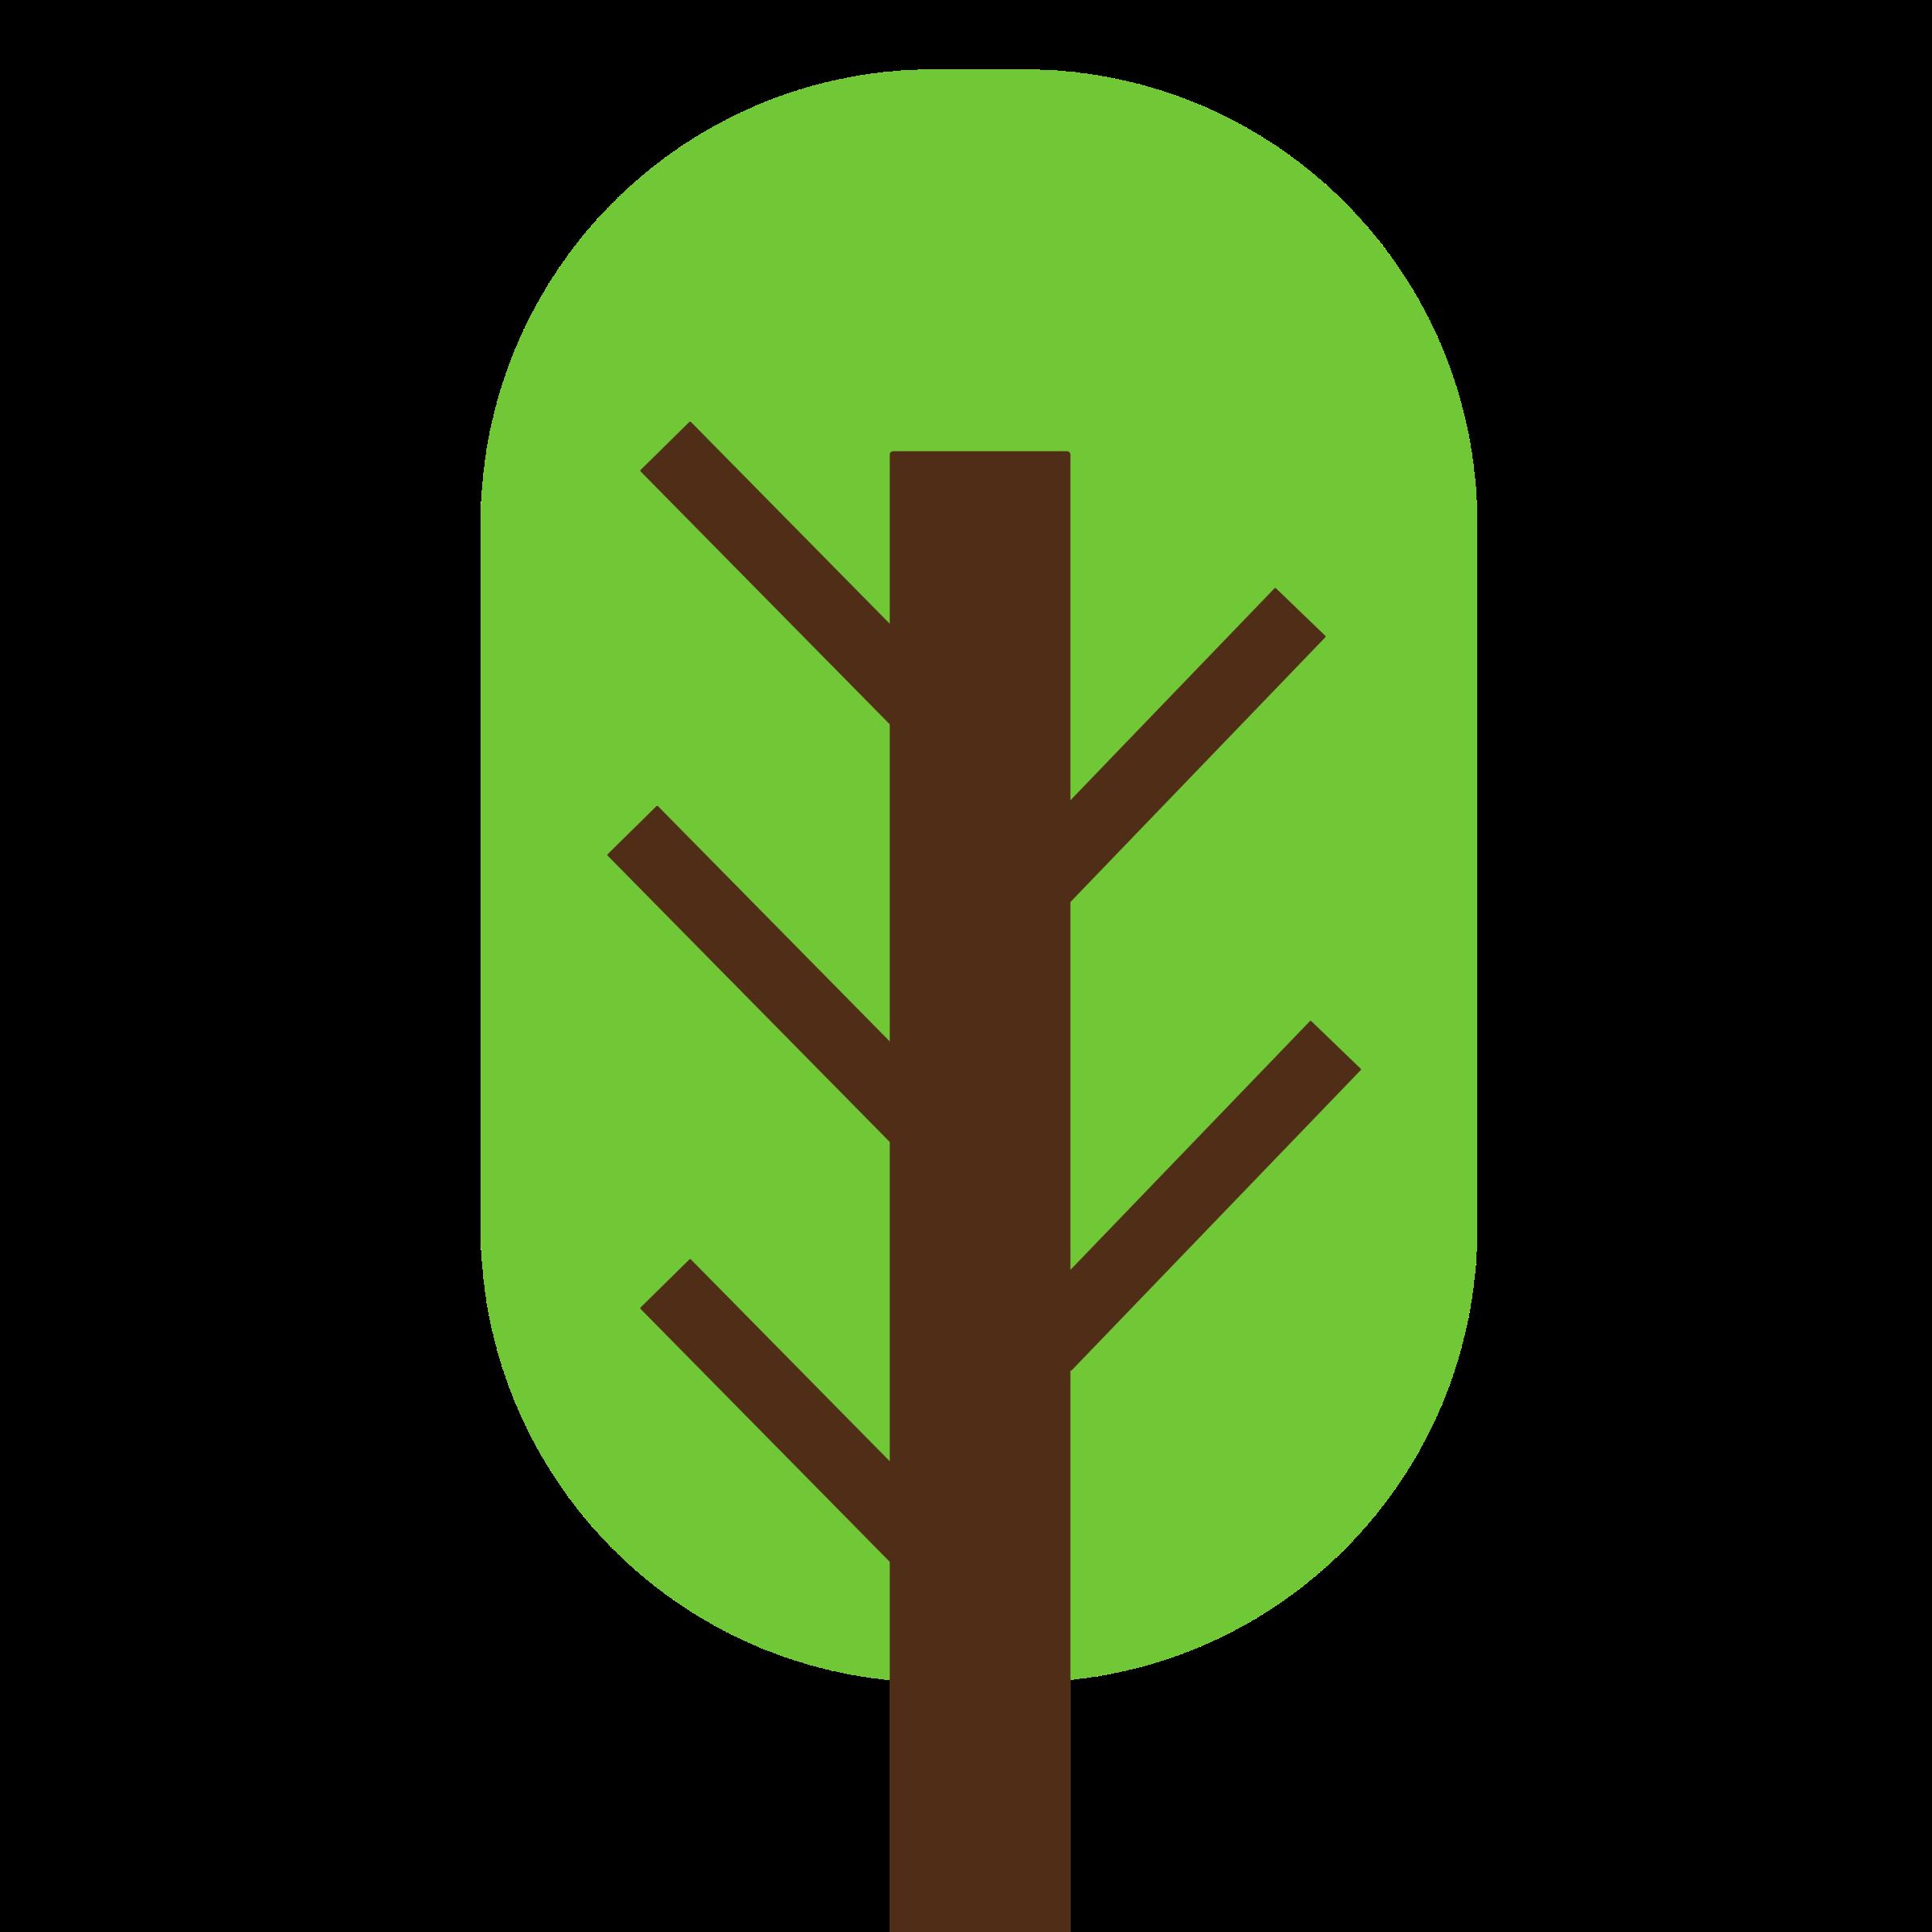 Square squarish and geometric. Color clipart tree